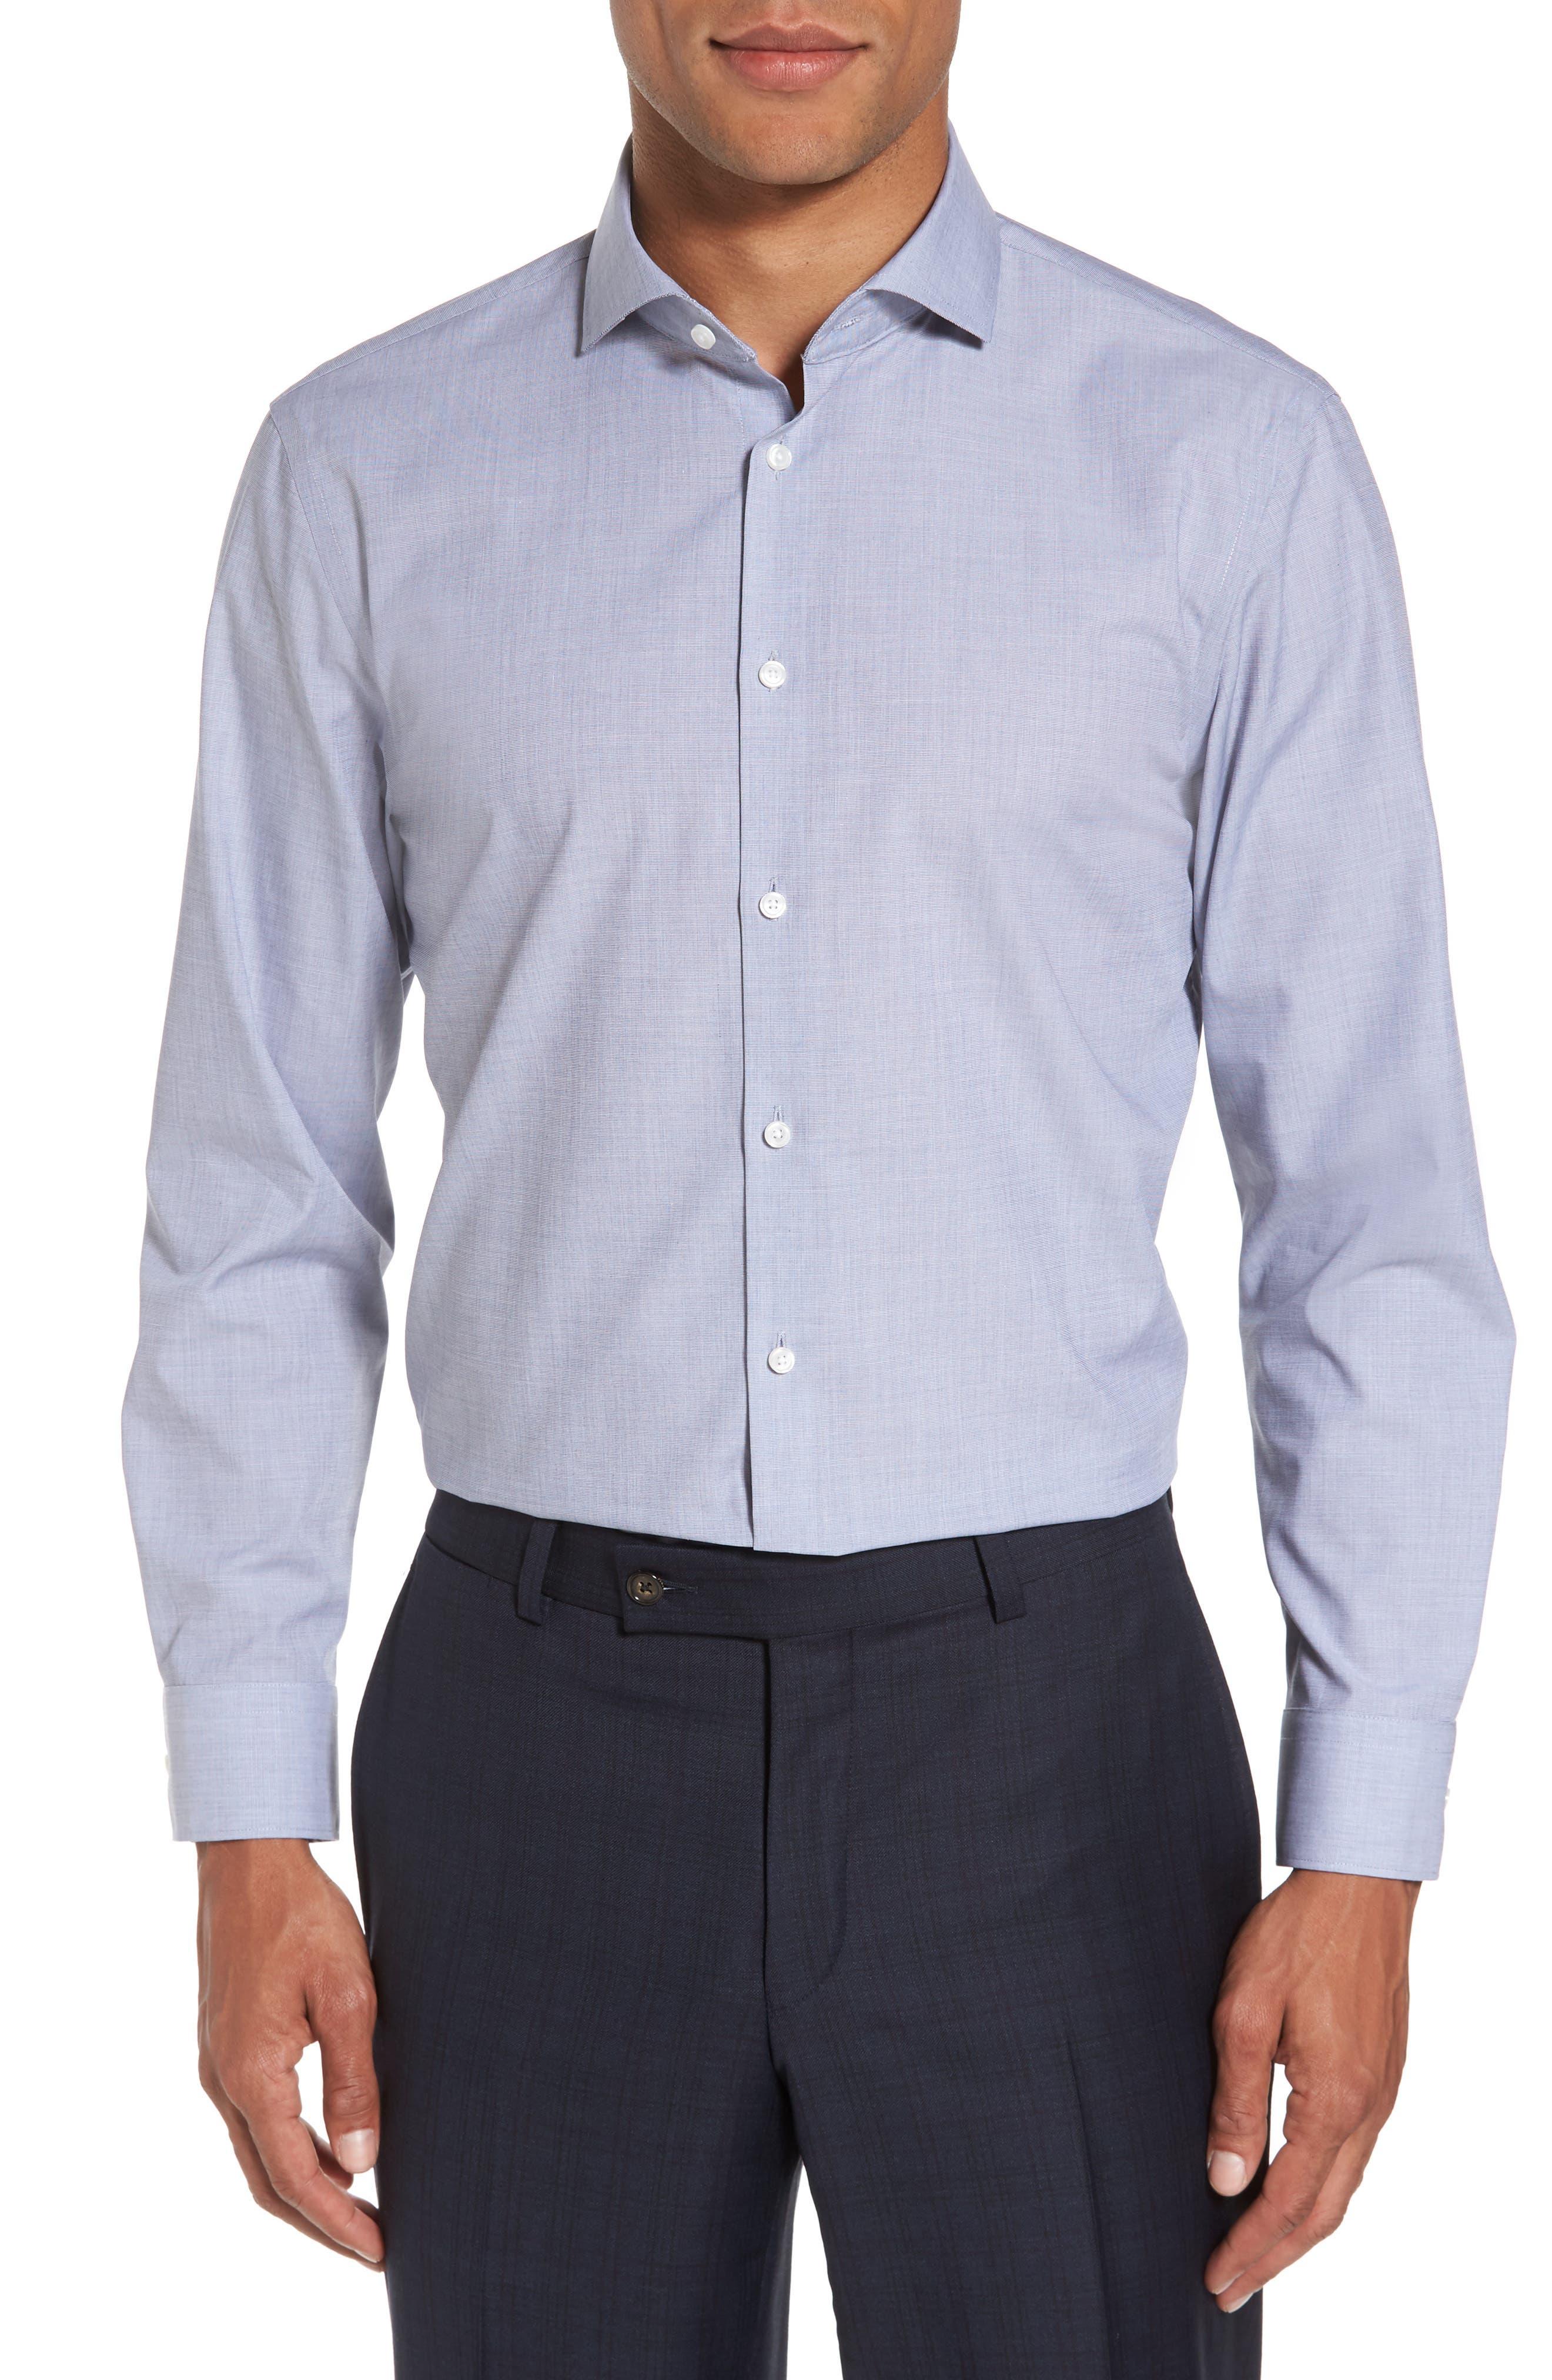 Extra Trim Fit Stretch No-Iron Dress Shirt,                             Main thumbnail 1, color,                             401